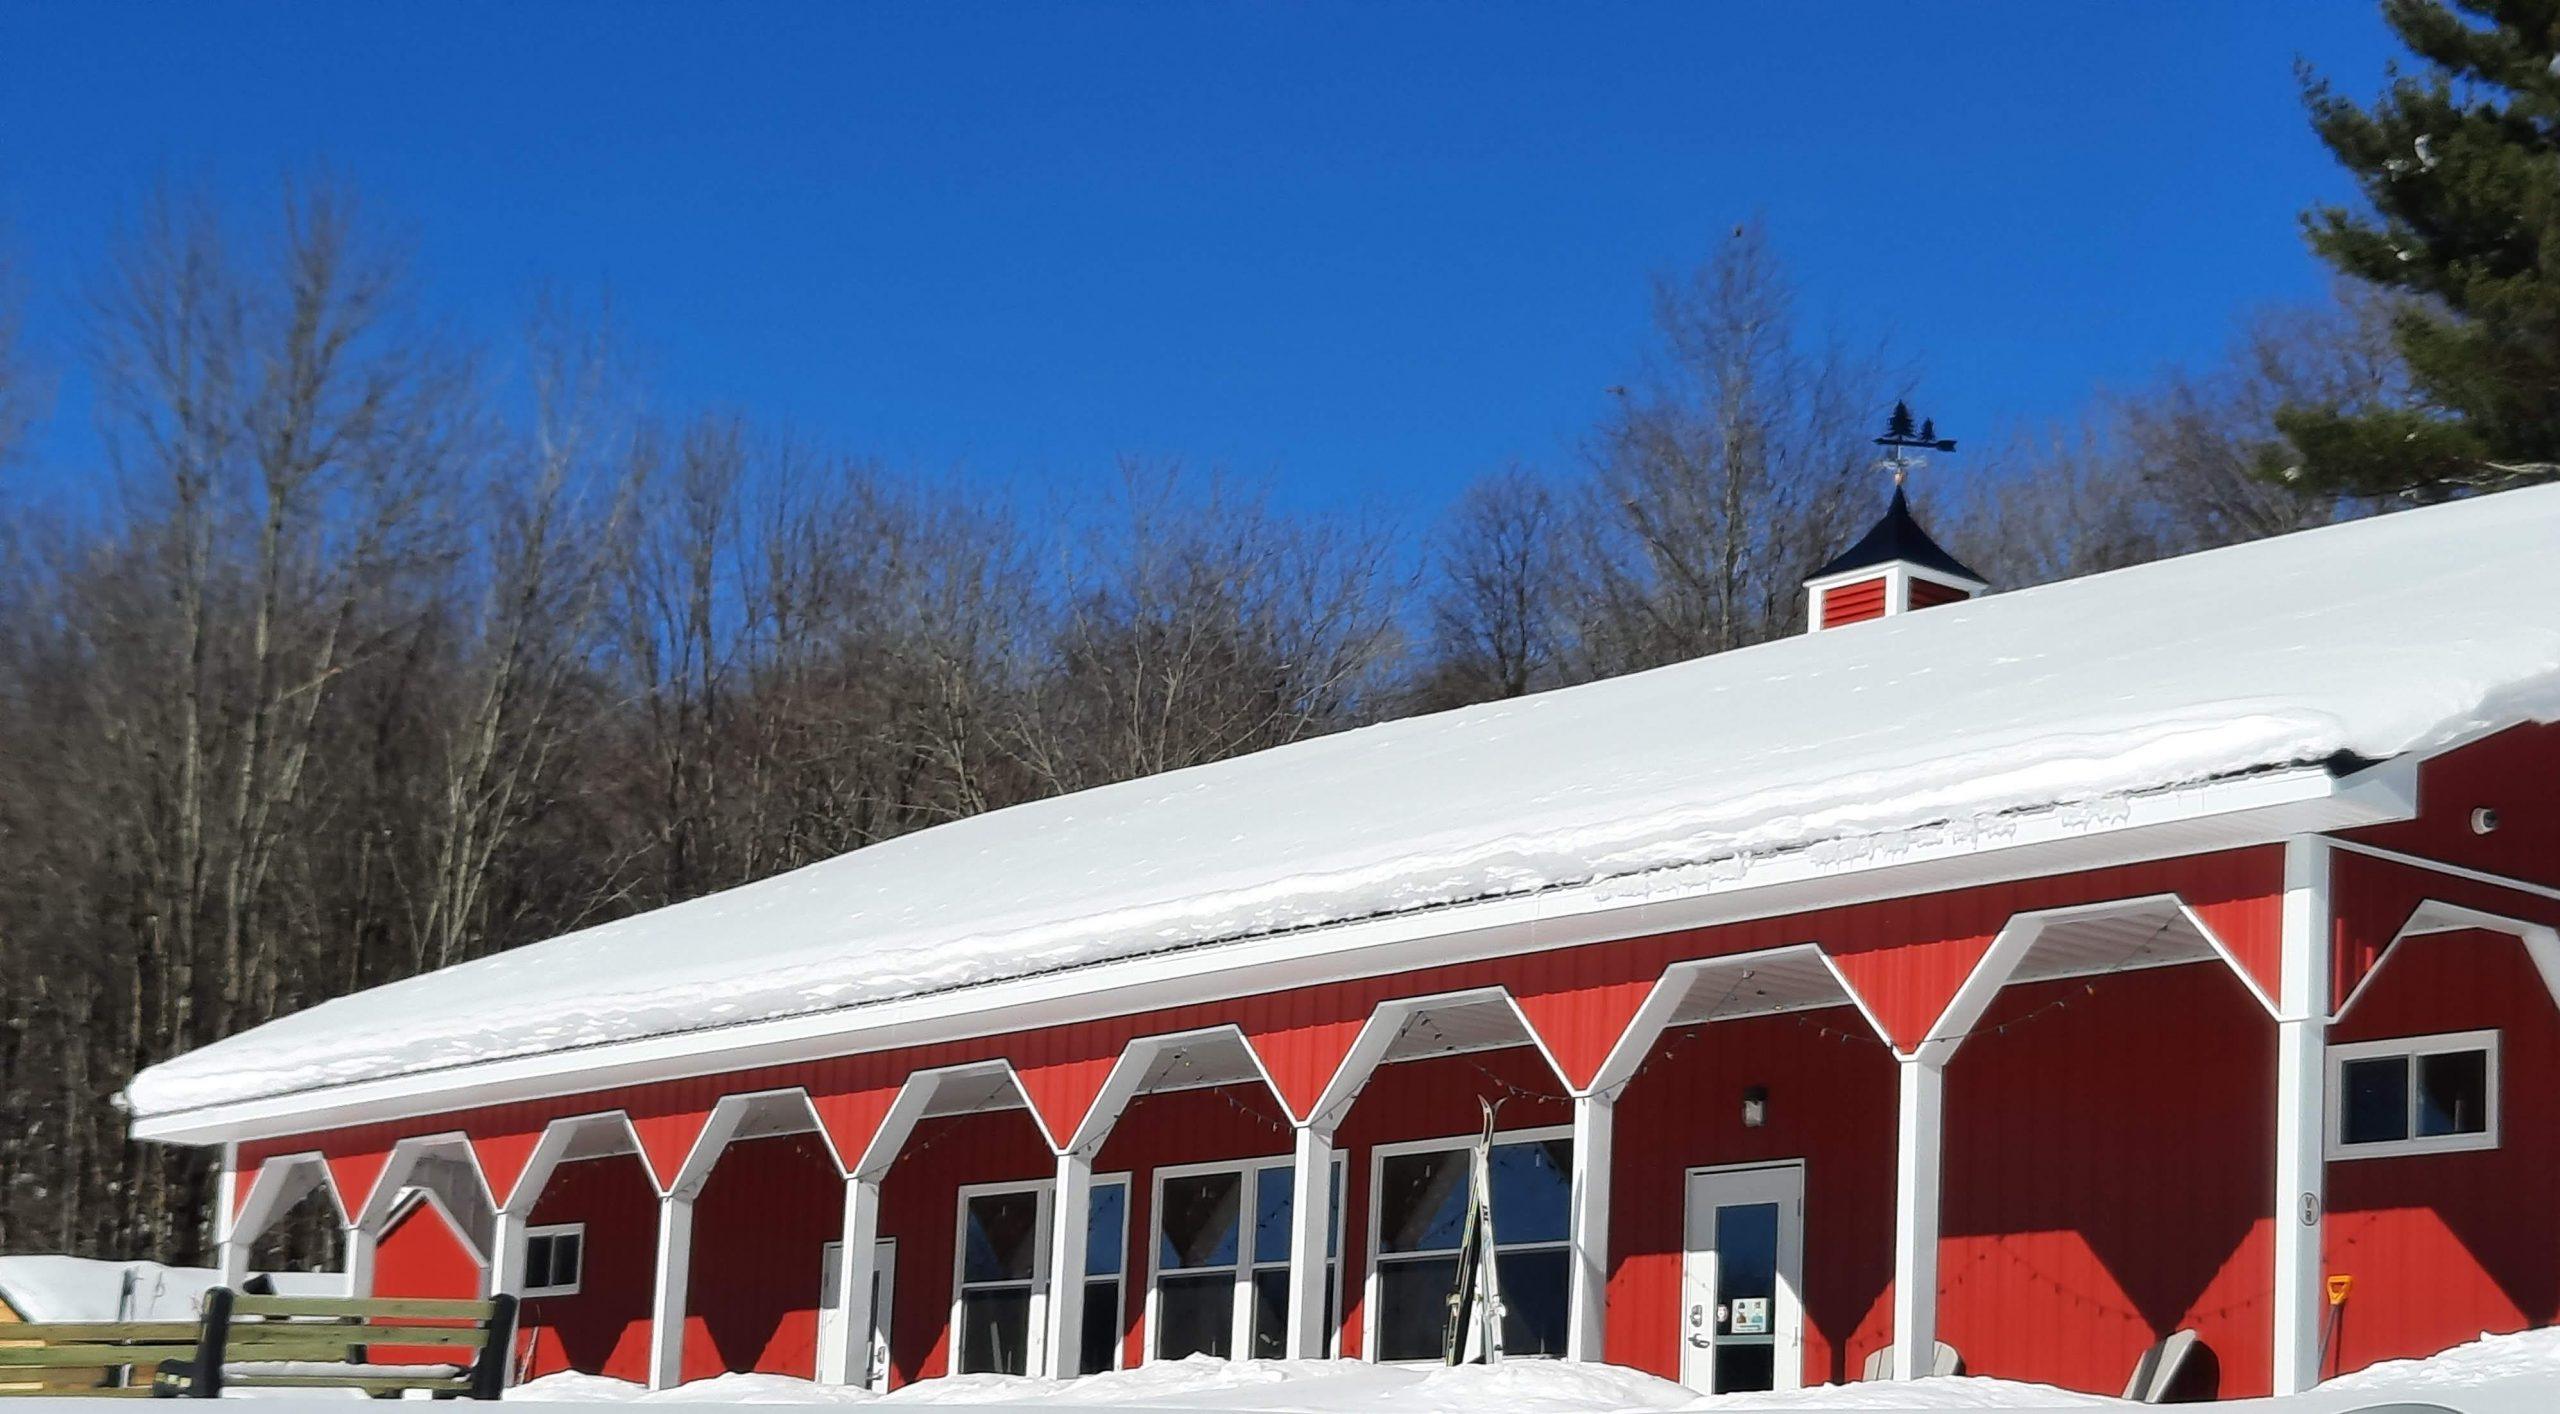 Osceola Ski & Sport Resort: Looking at Porch